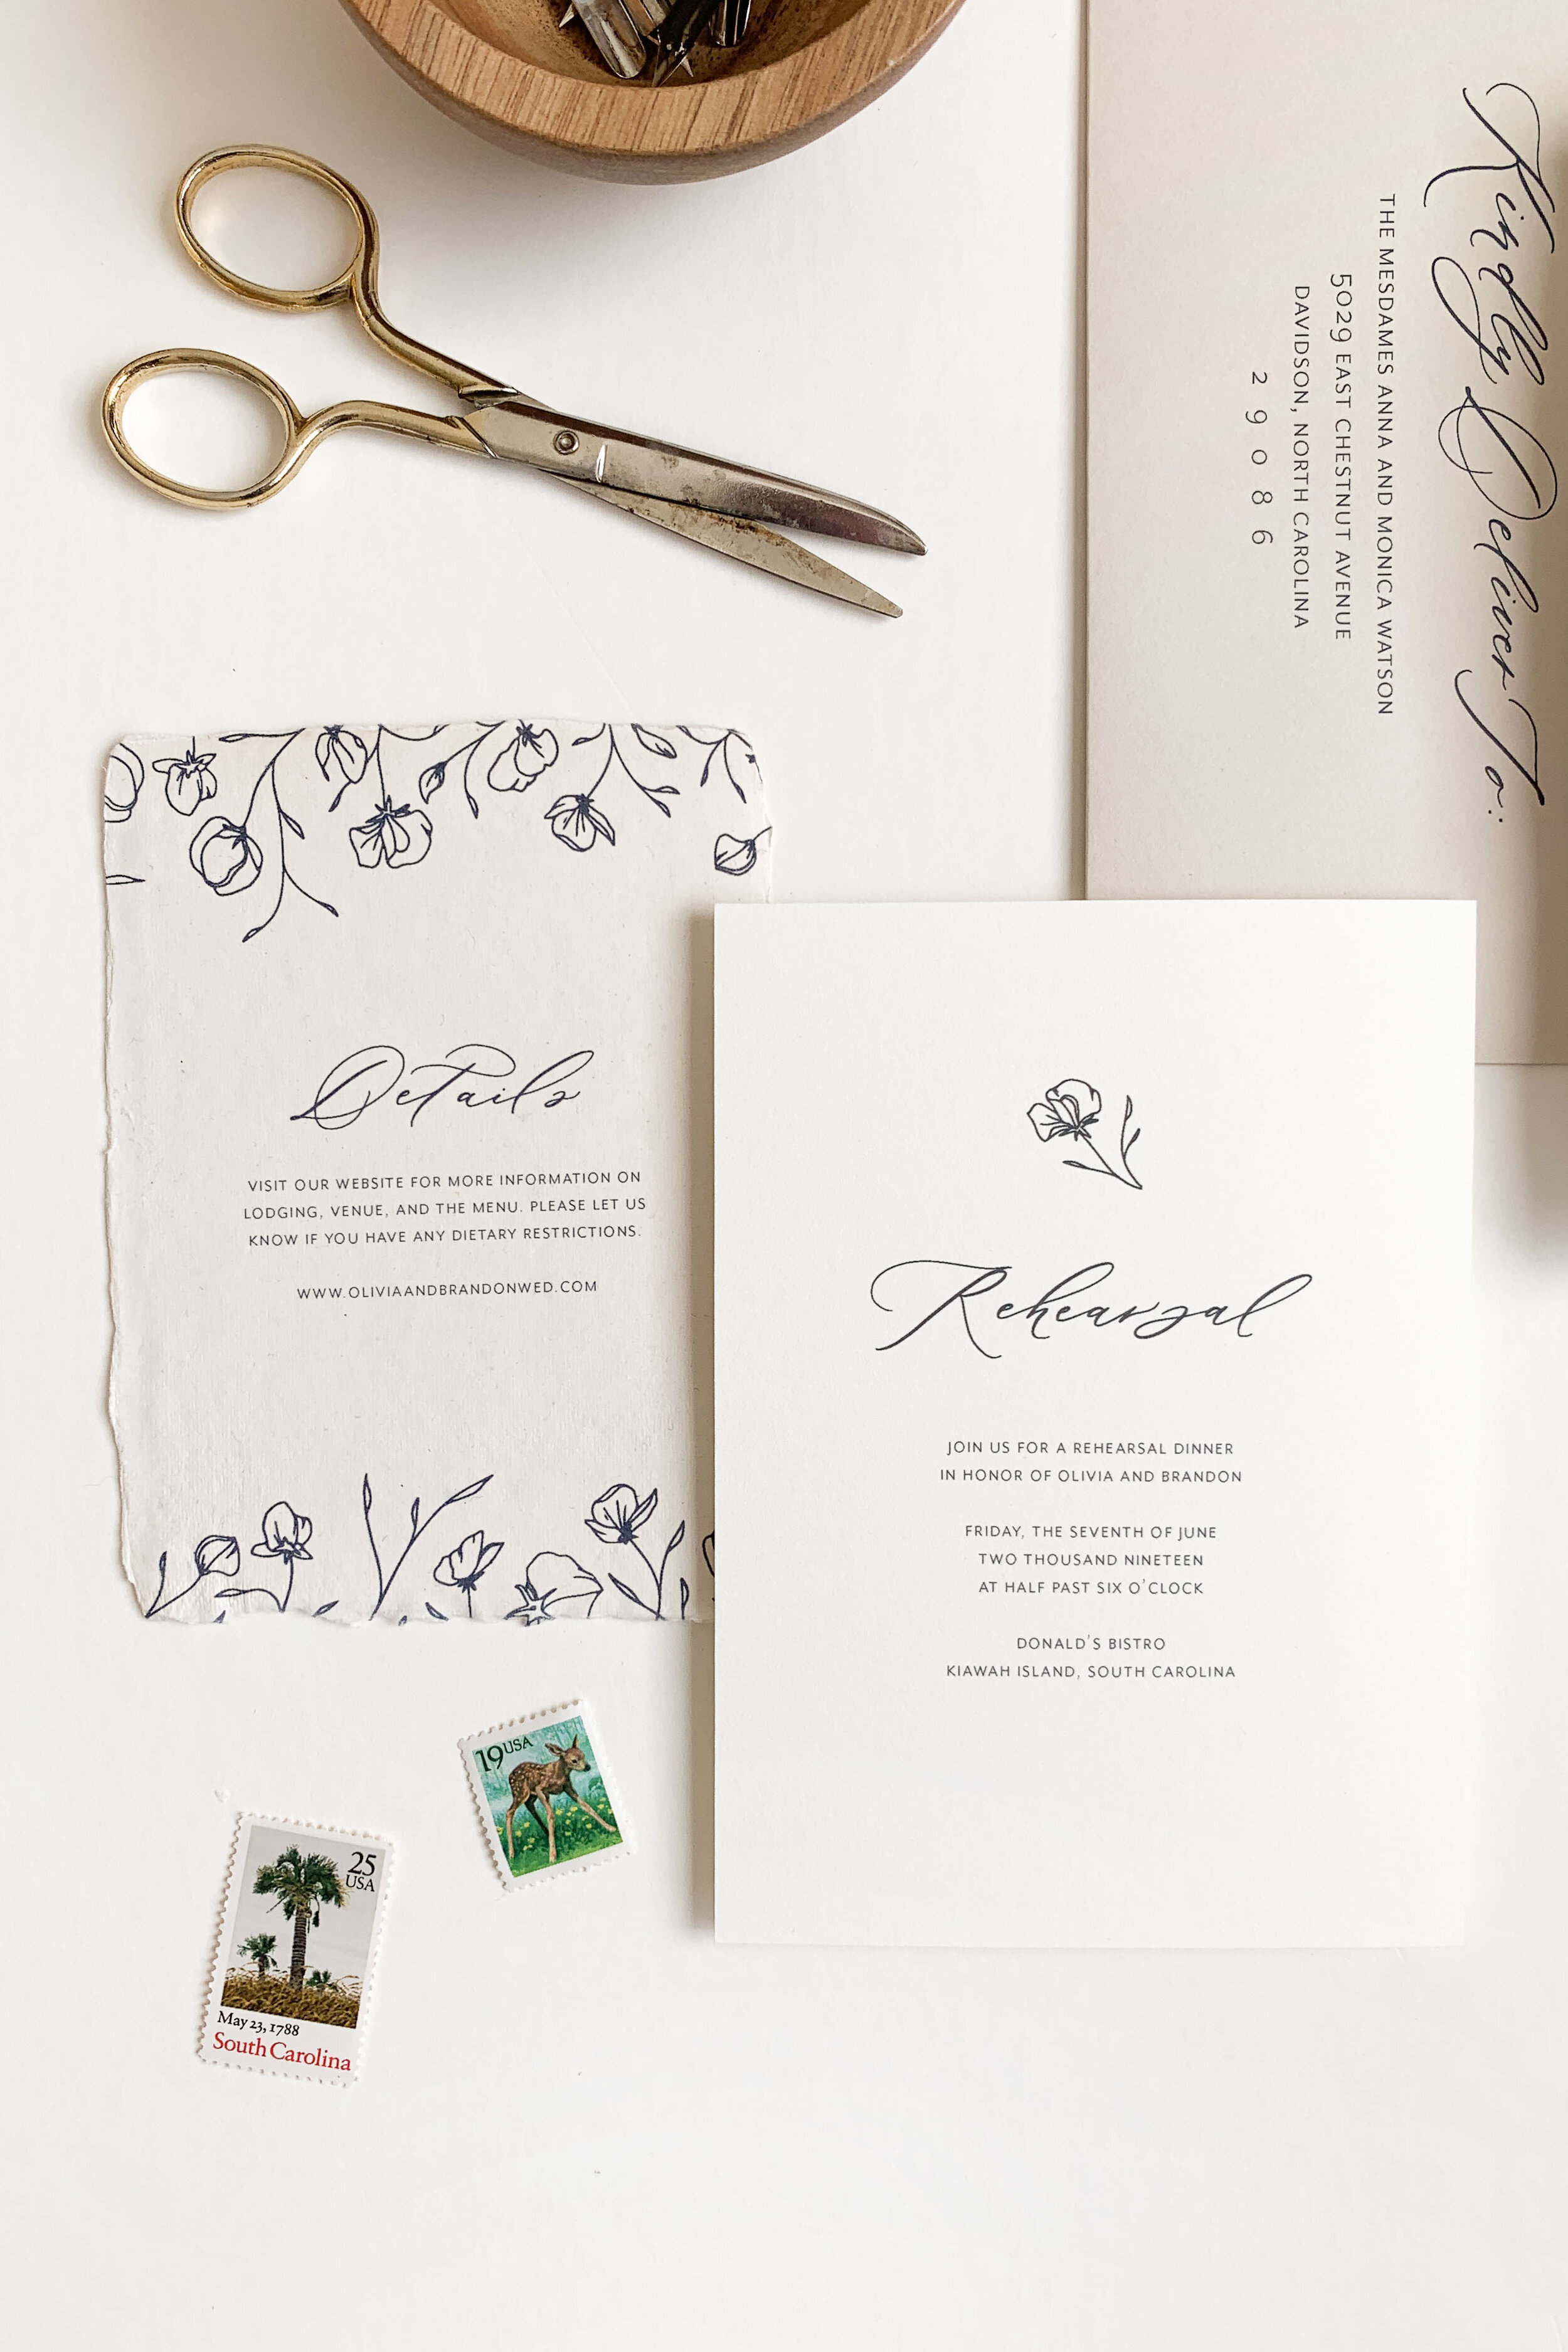 Floral elegant wedding invitations. Navy blue wedding invitations. Sweet pea wedding stationery. Floral calligraphy wedding invitations on handmade paper.